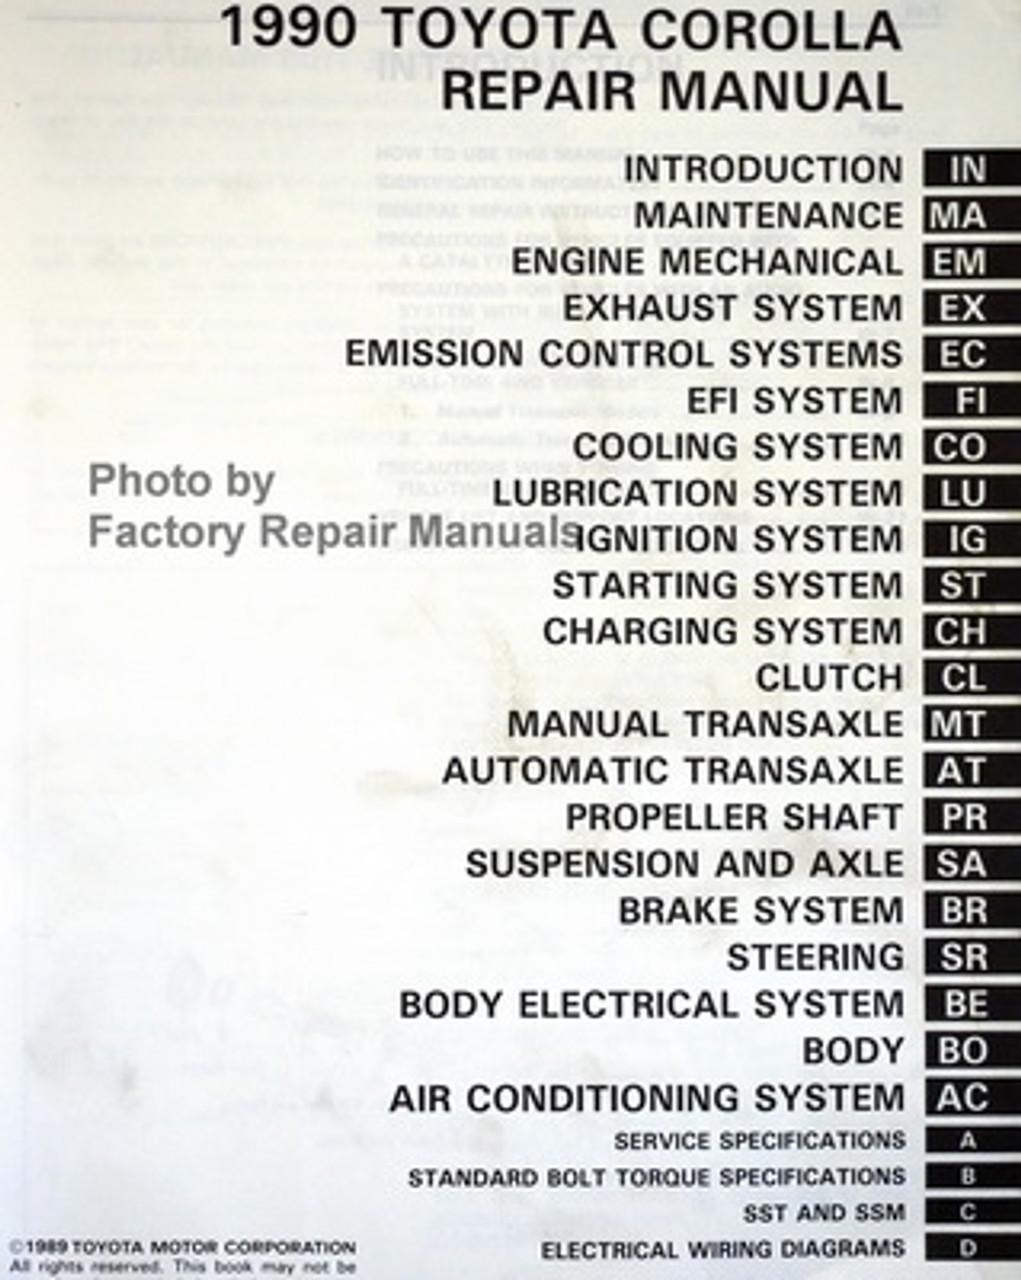 1990 toyota corolla factory service manual original shop repair - factory  repair manuals  factory repair manuals